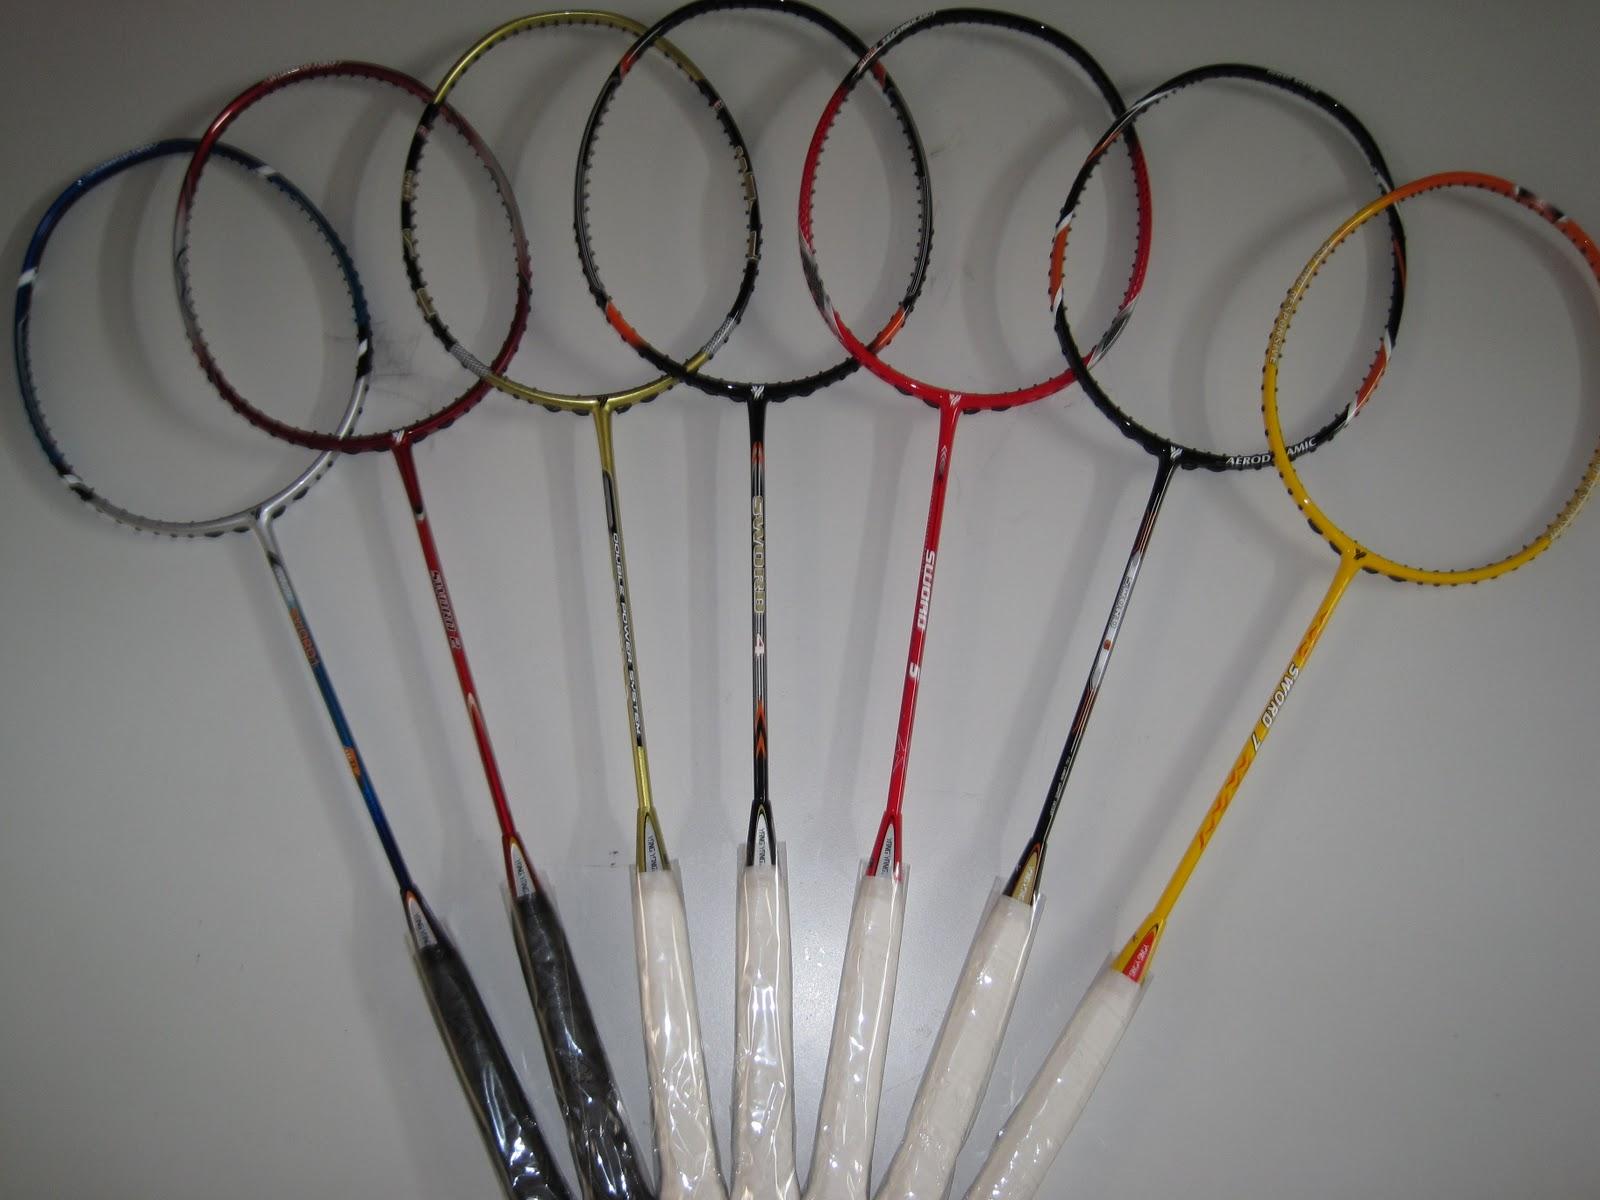 Yang Yang Sportsware review: How to choose a badminton racket